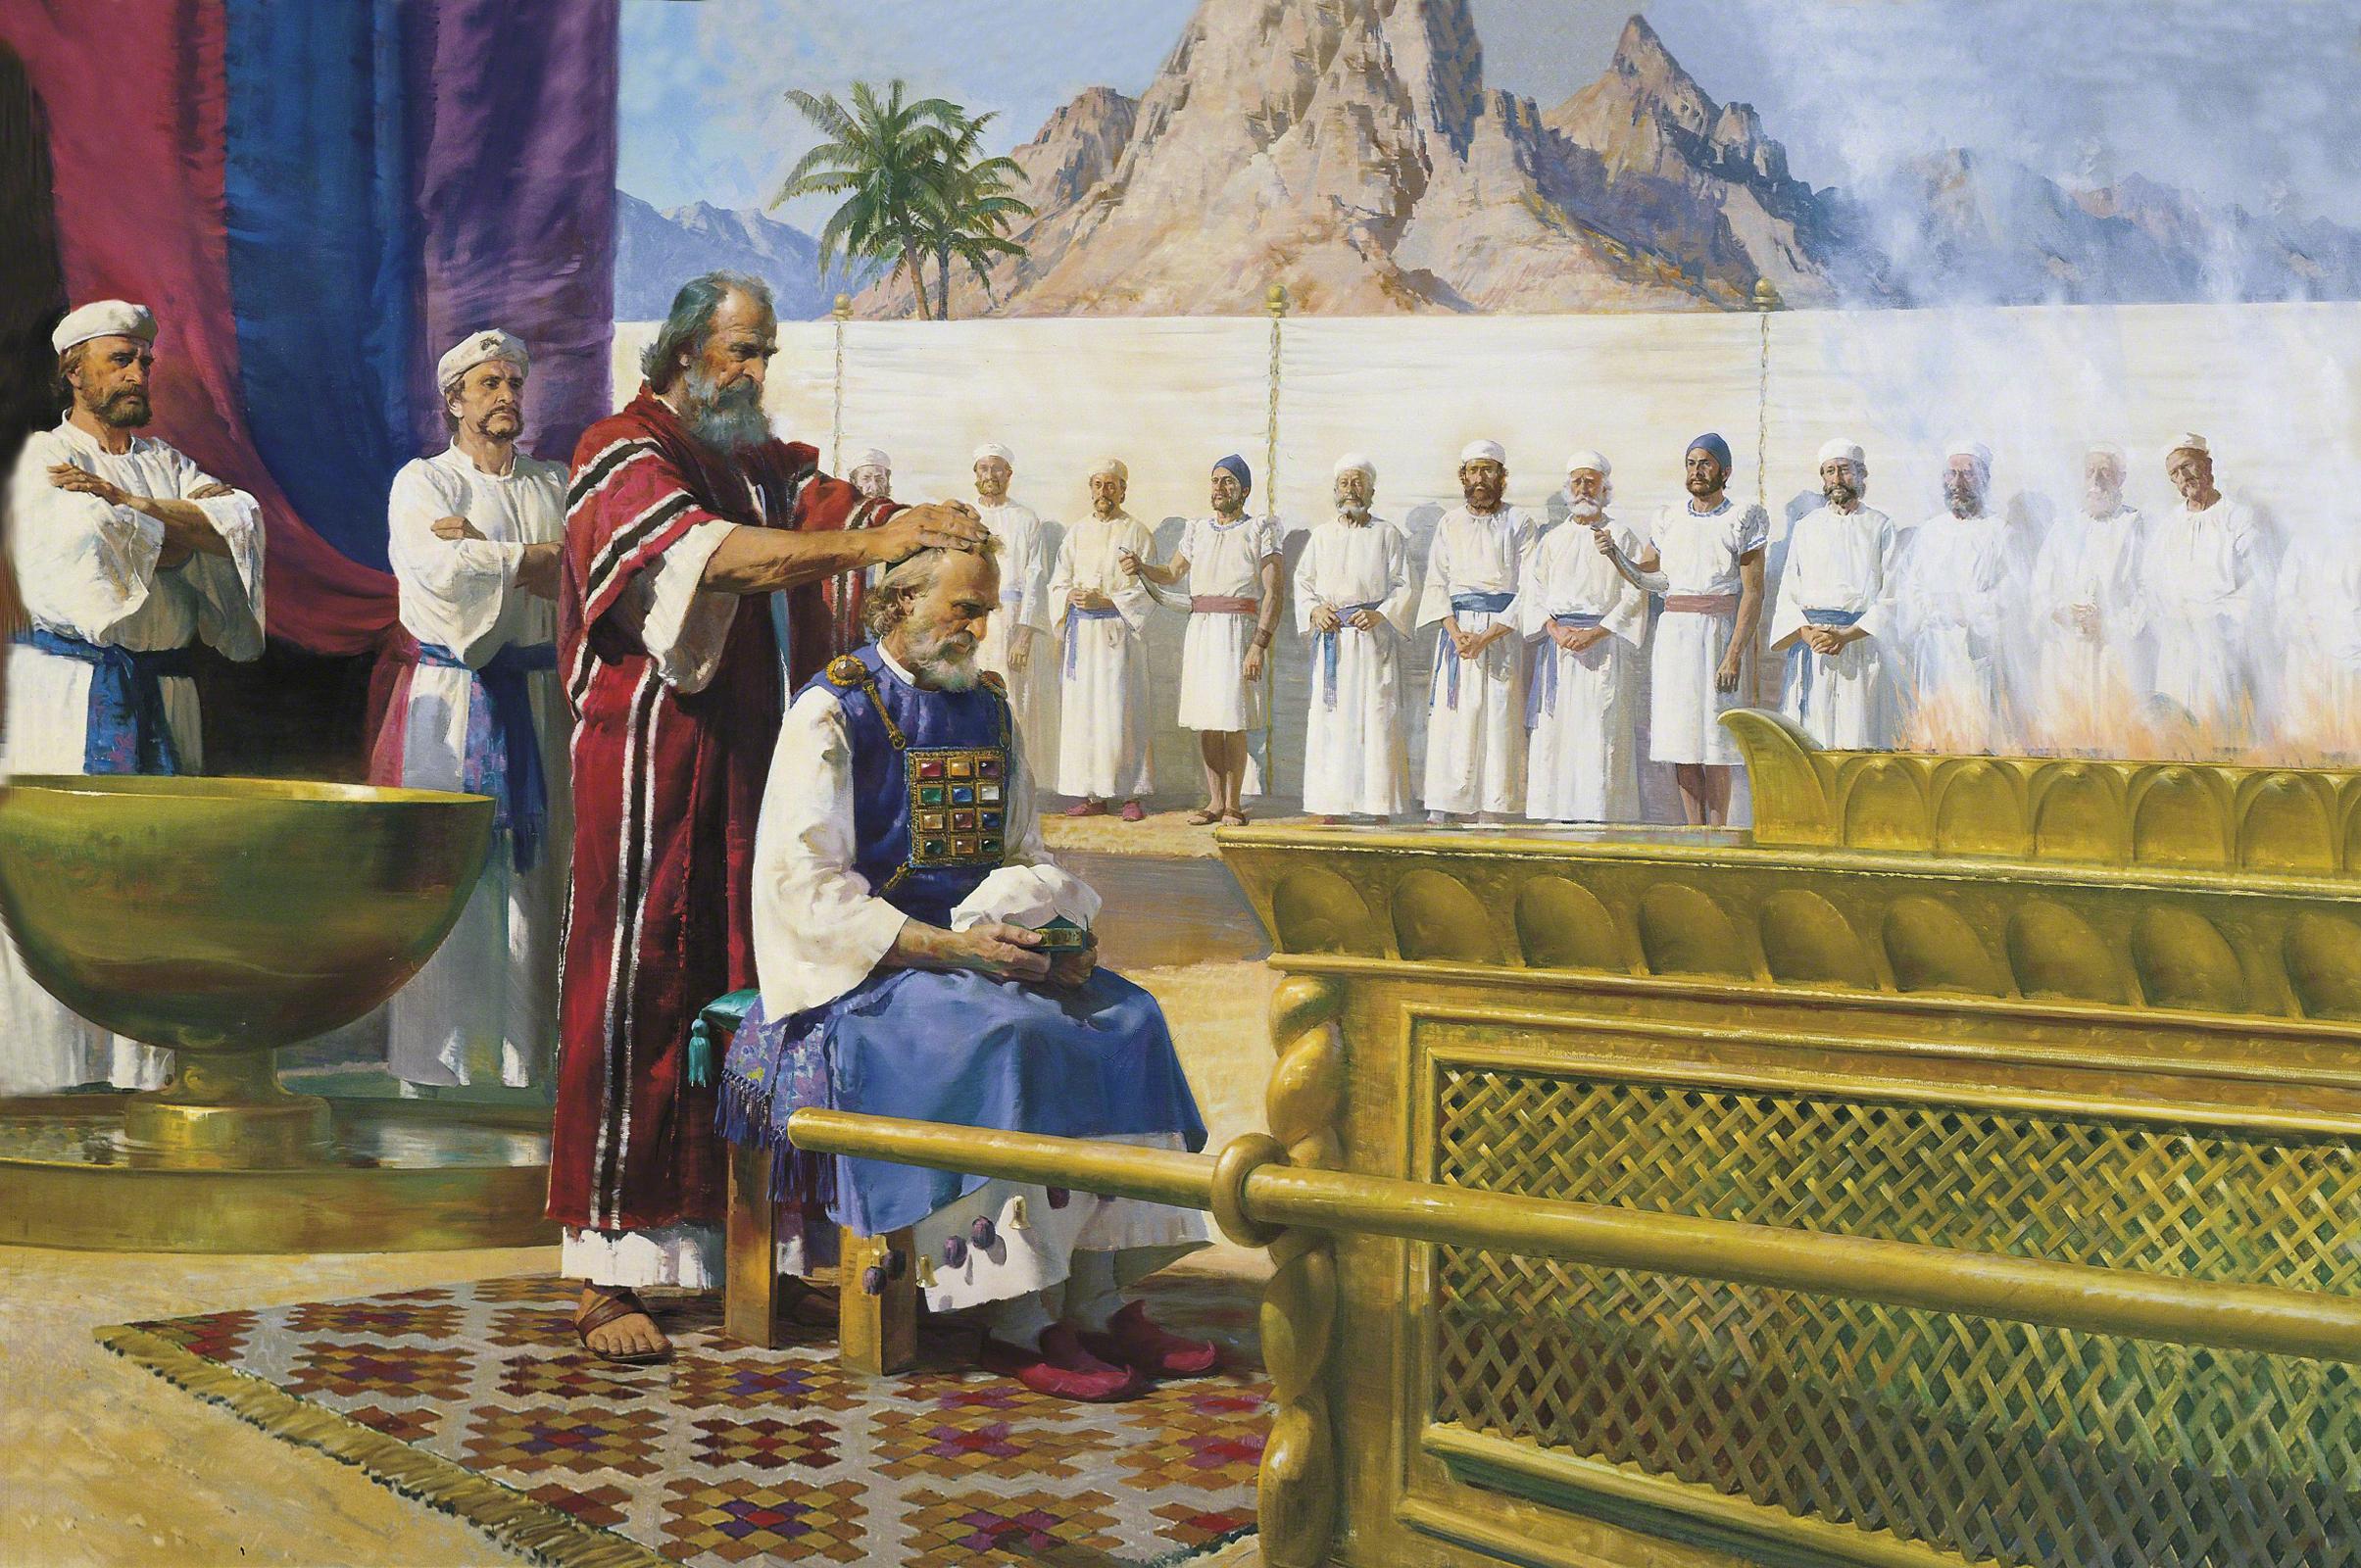 Resultado de imagem para priest in old testament